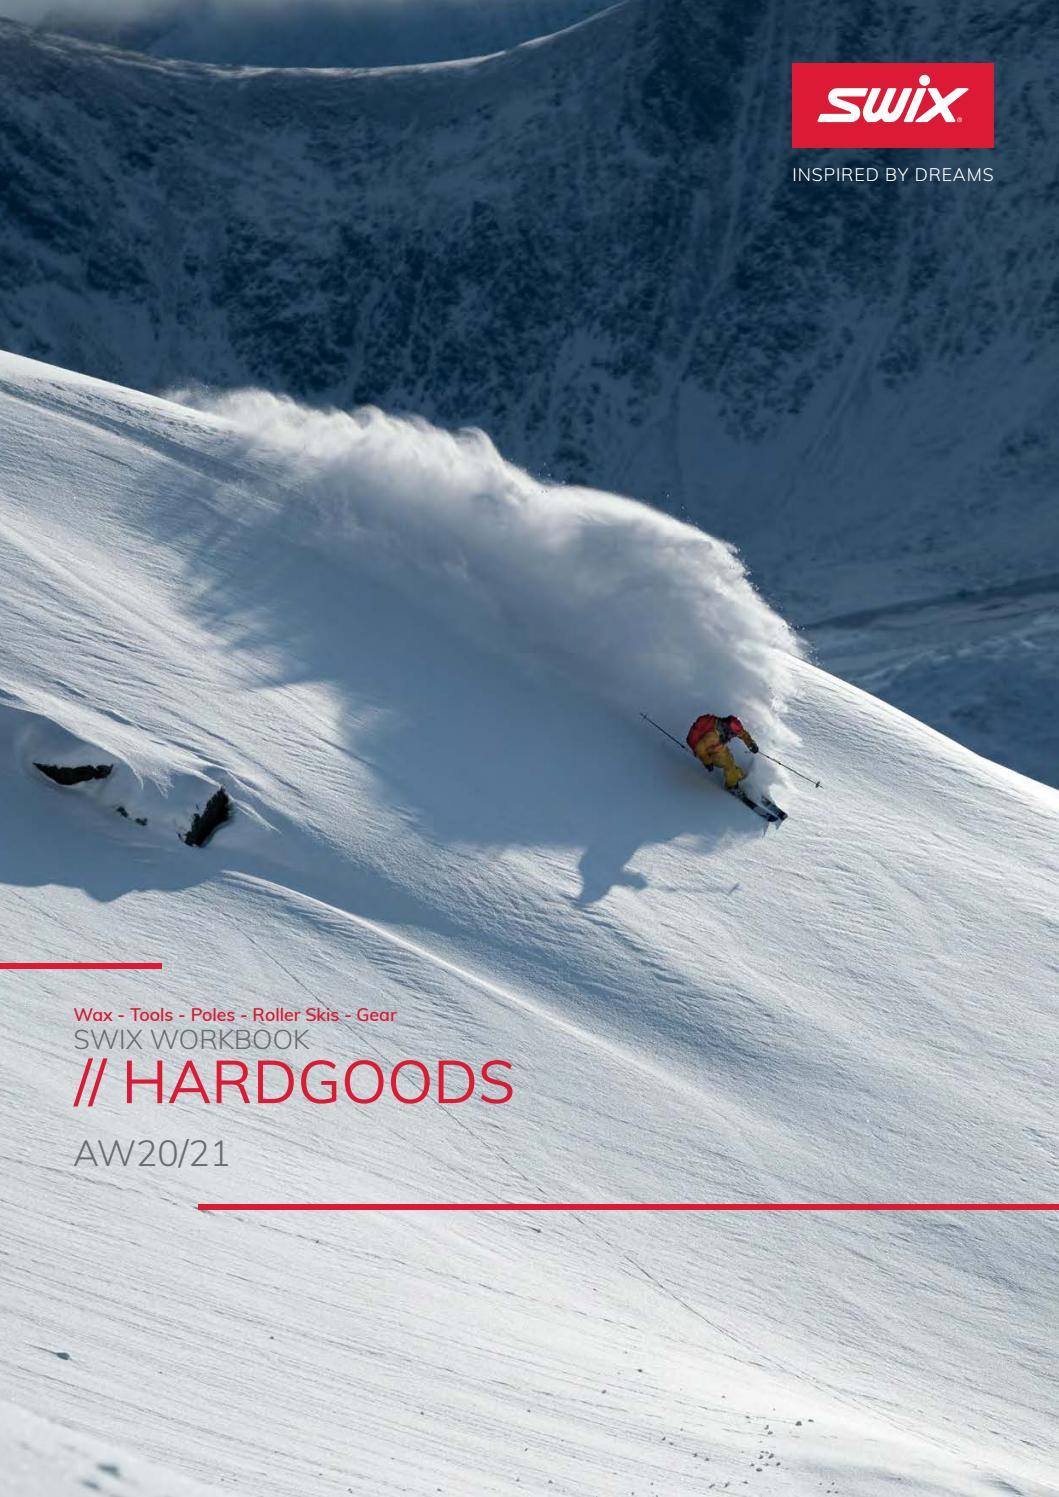 3 6 Pairs - Black//Orange 3 Warm Comfortable Snowboard // Skiing Socks + Black//Silver Elite Wool Race Ski Socks , Large//X-Large